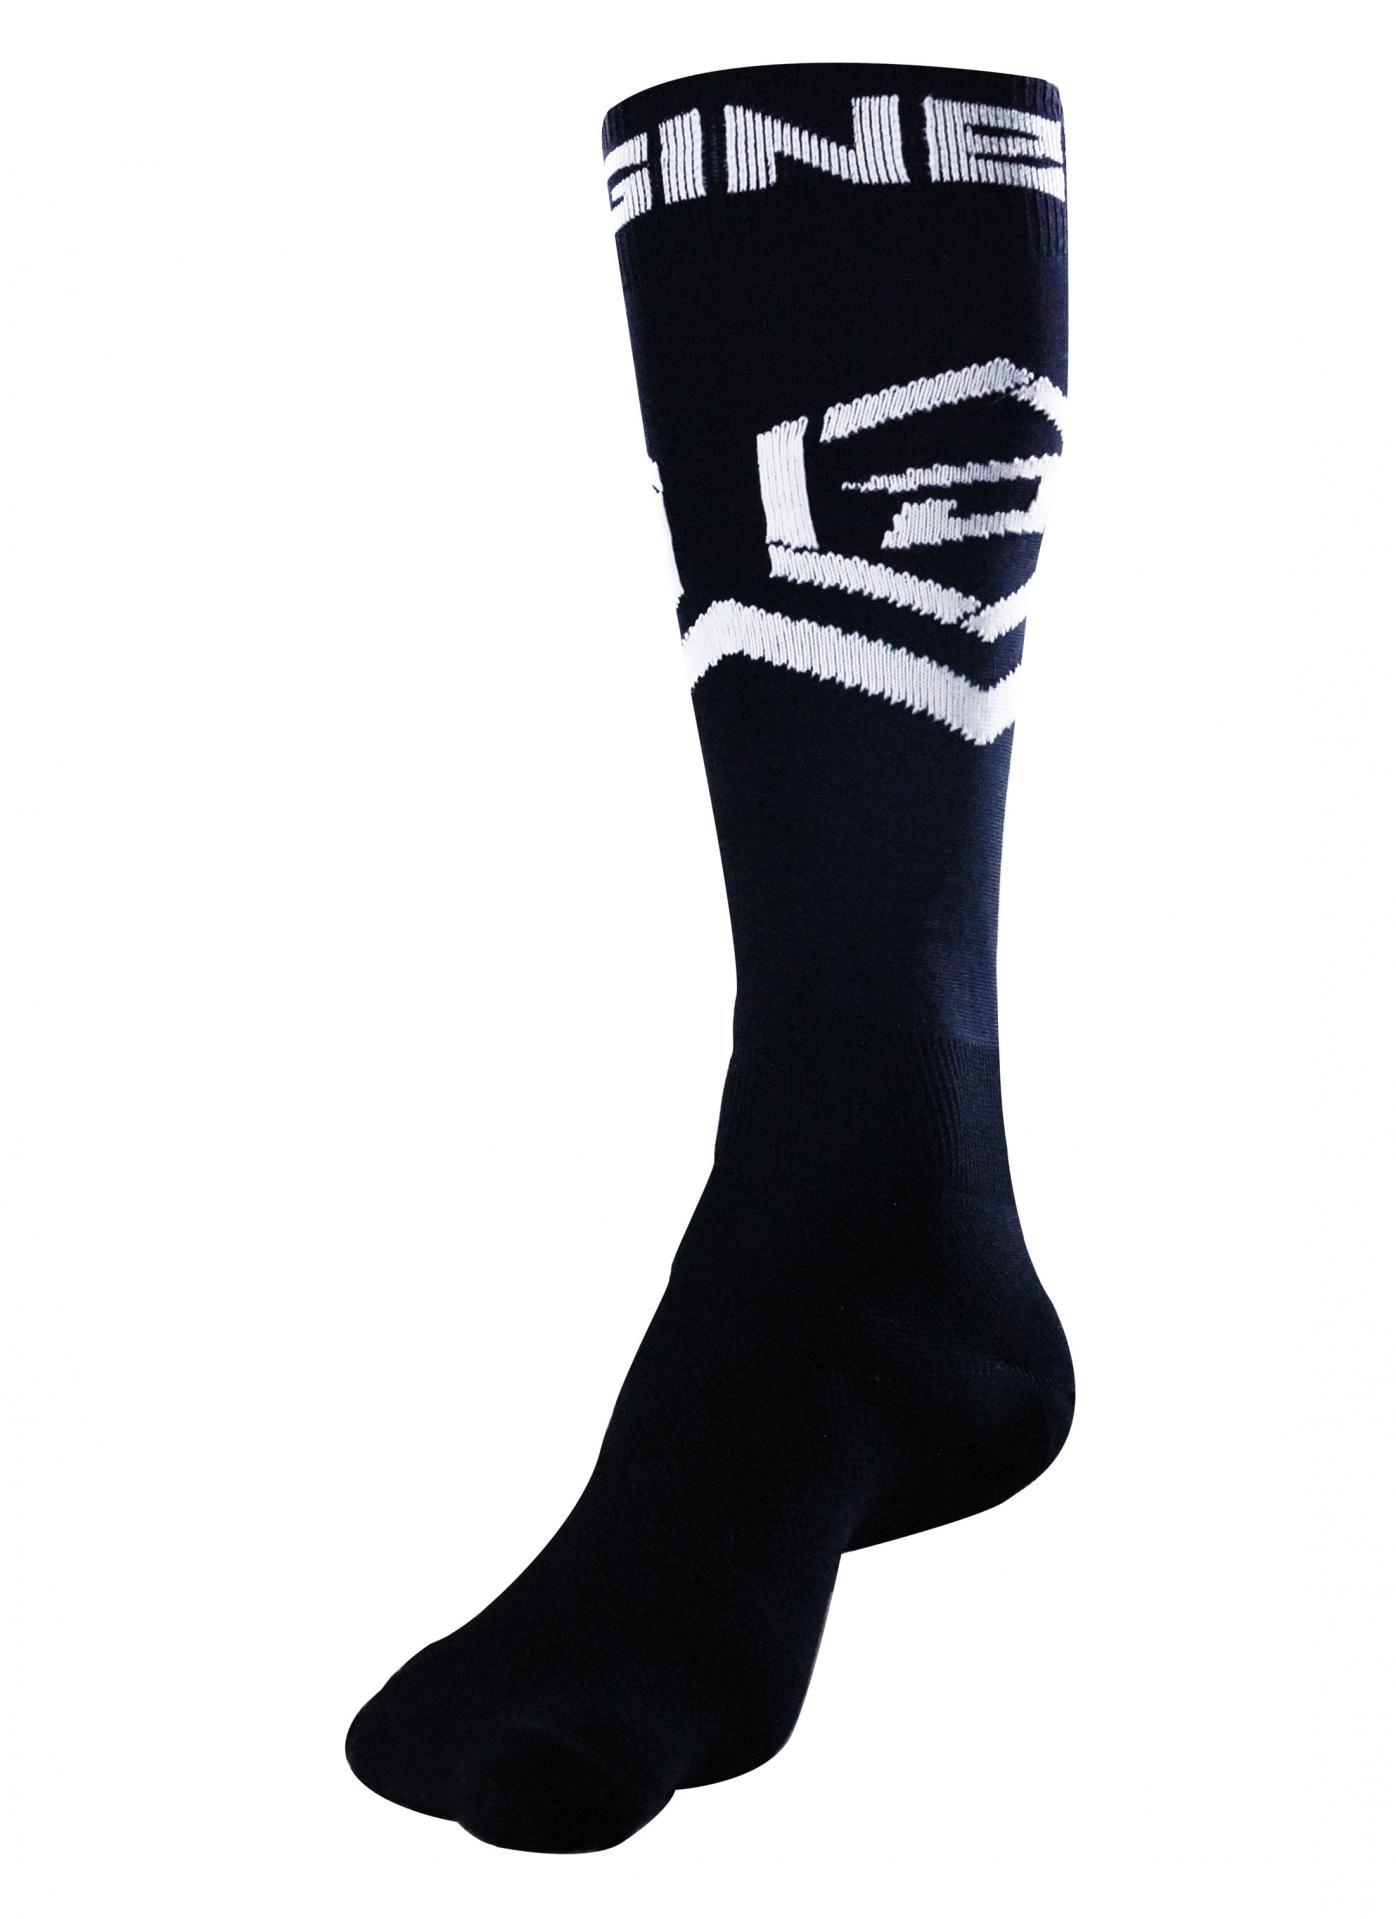 Socks 2017 noir longue2